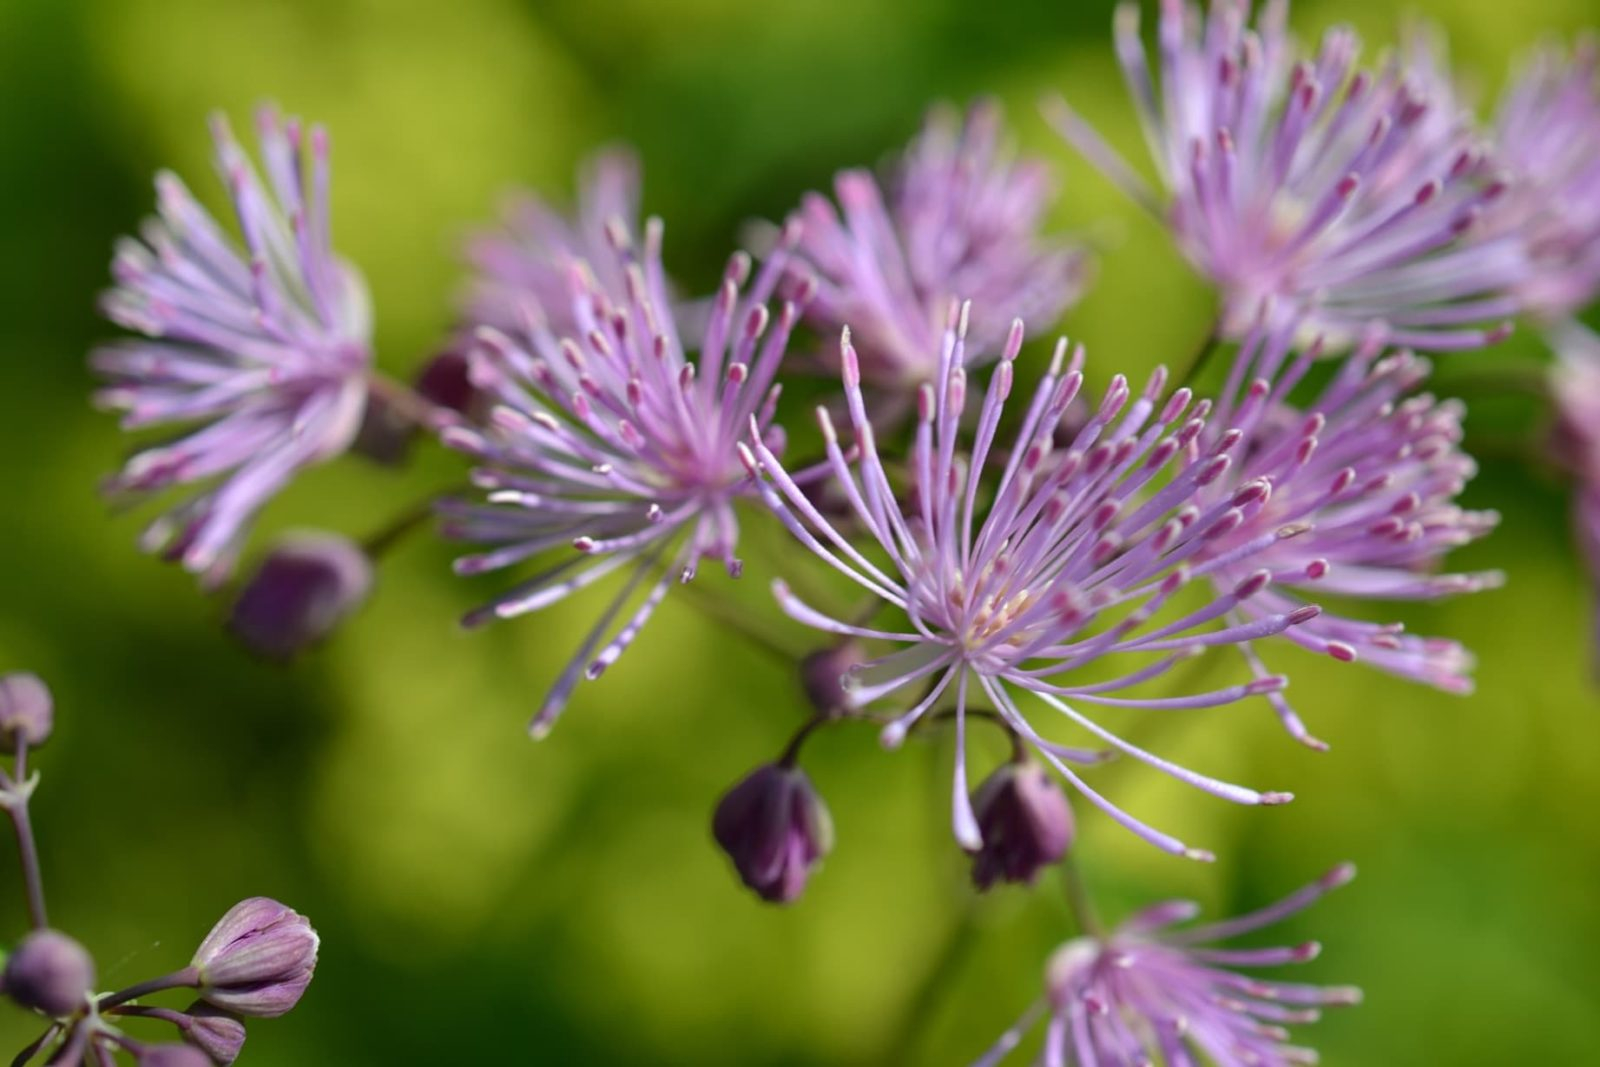 purple thalictrum blooms